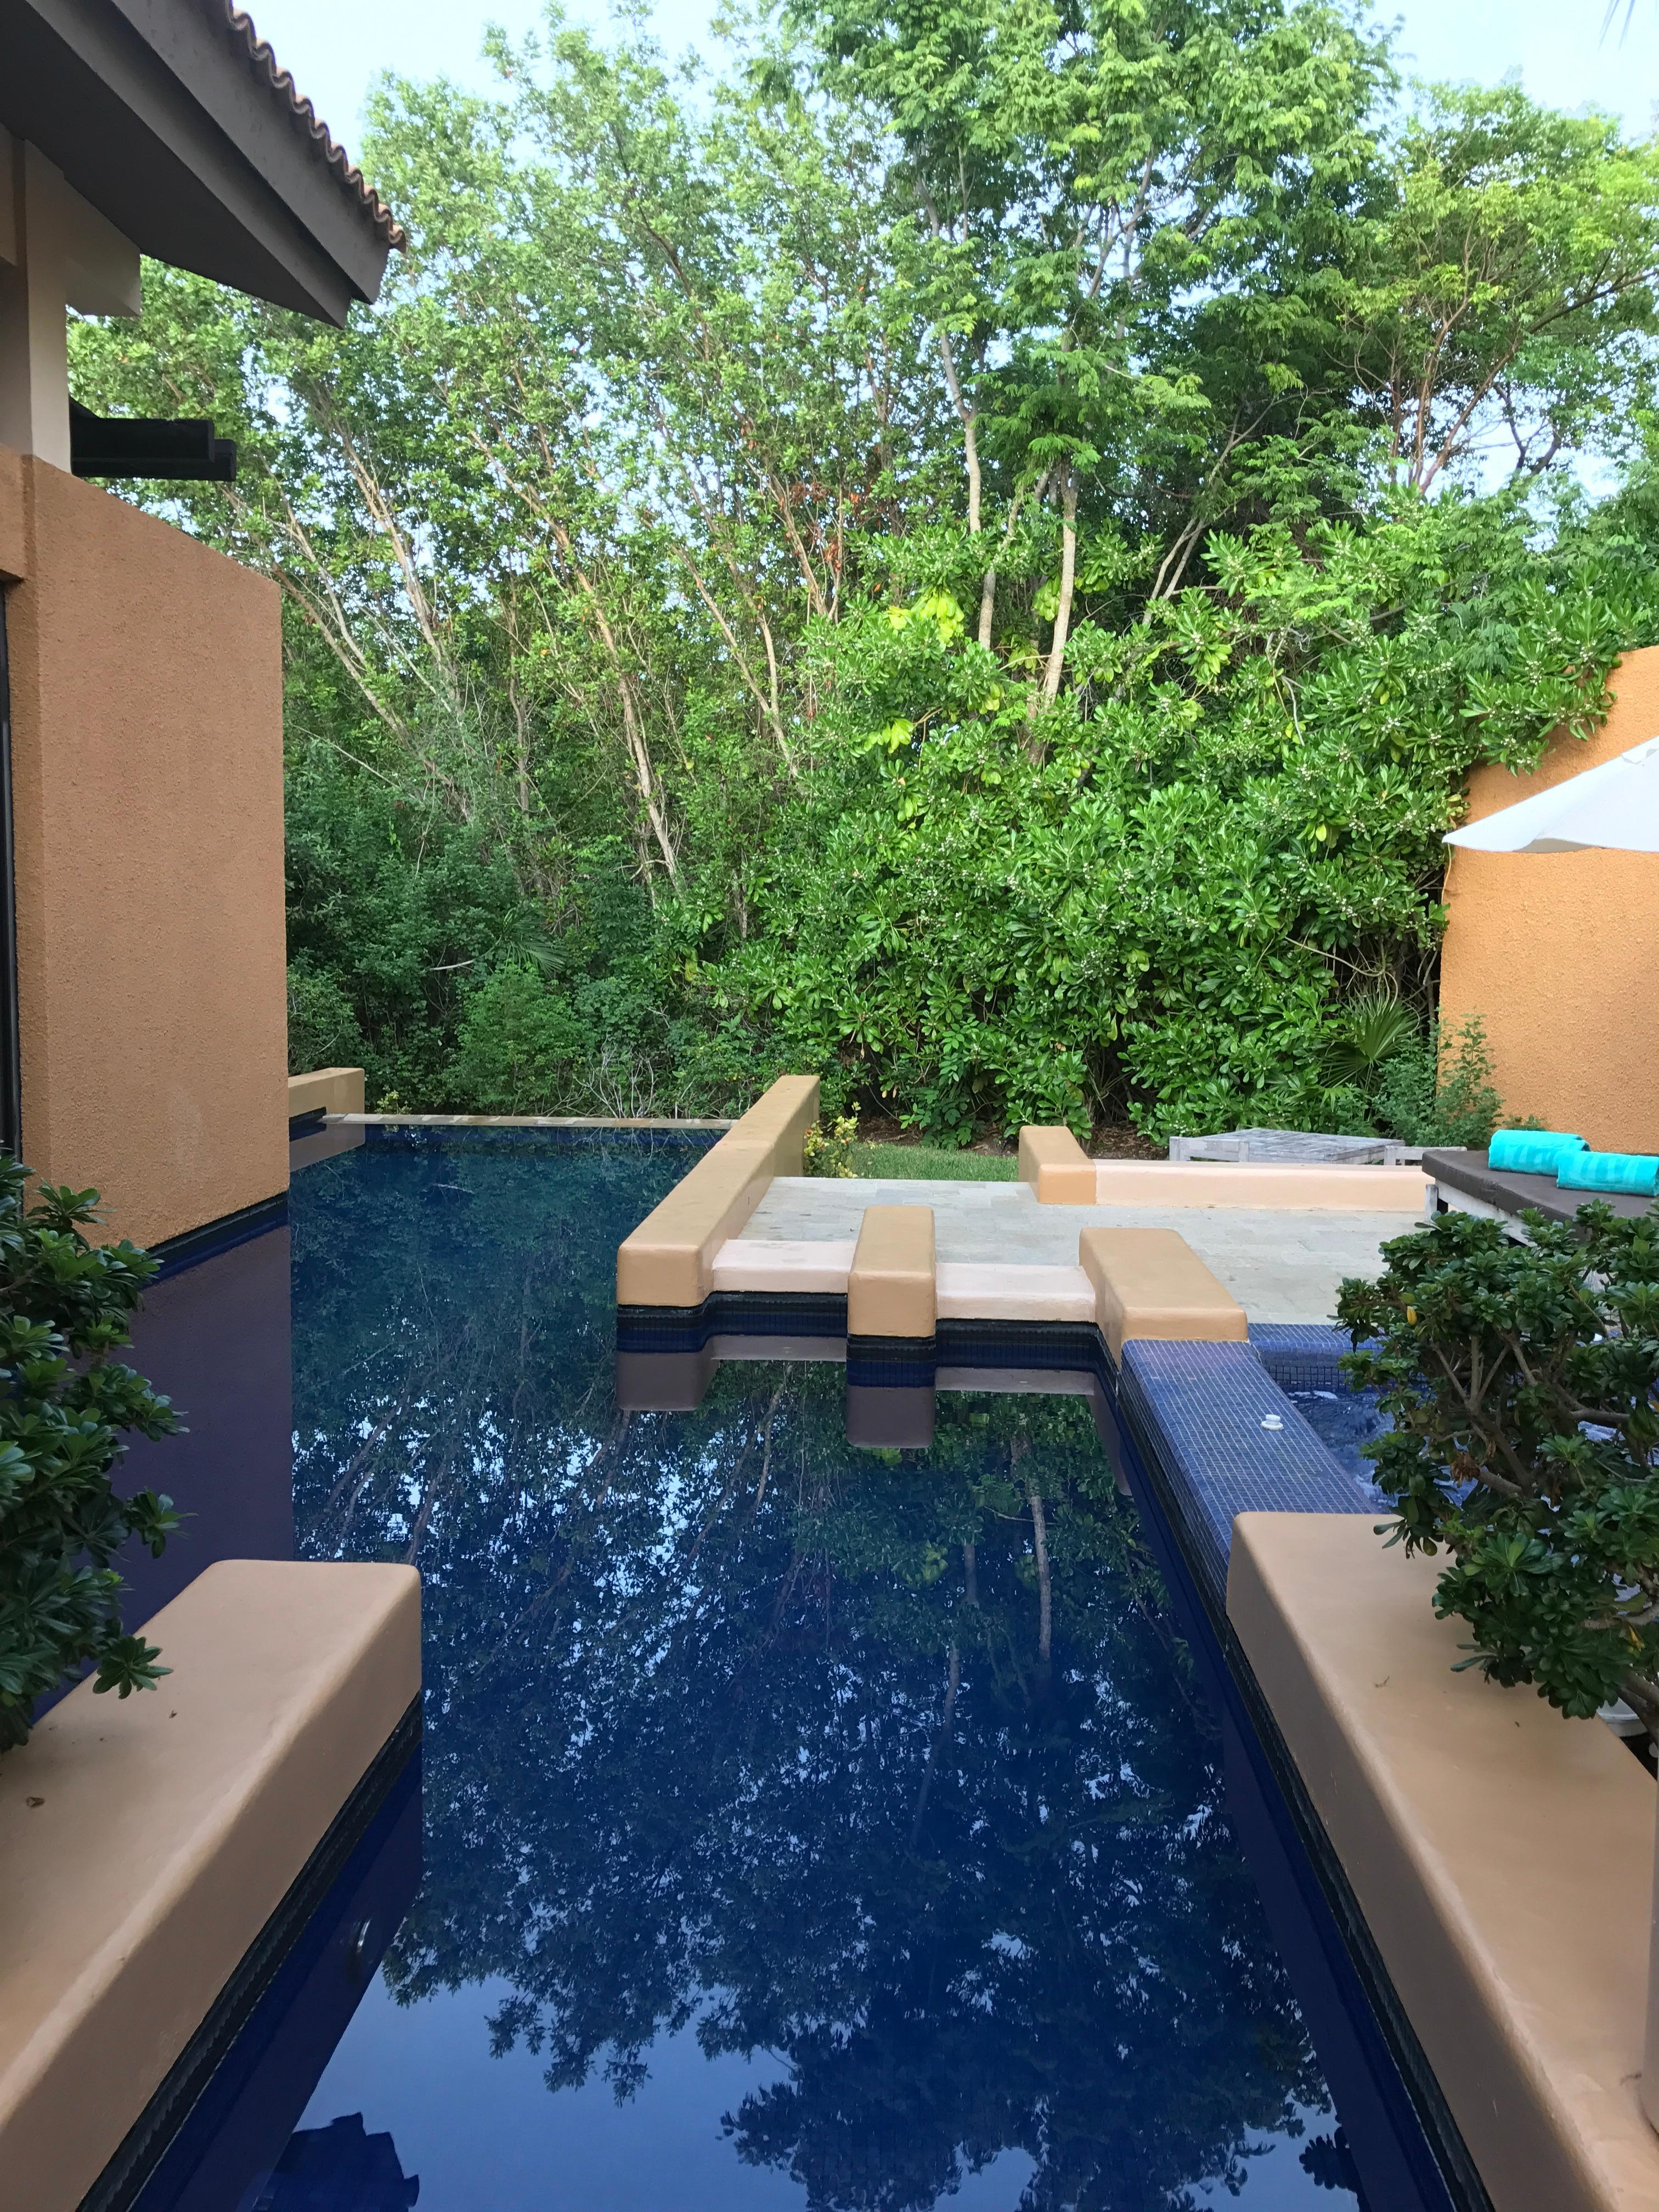 Villa pool & Jacuzzi